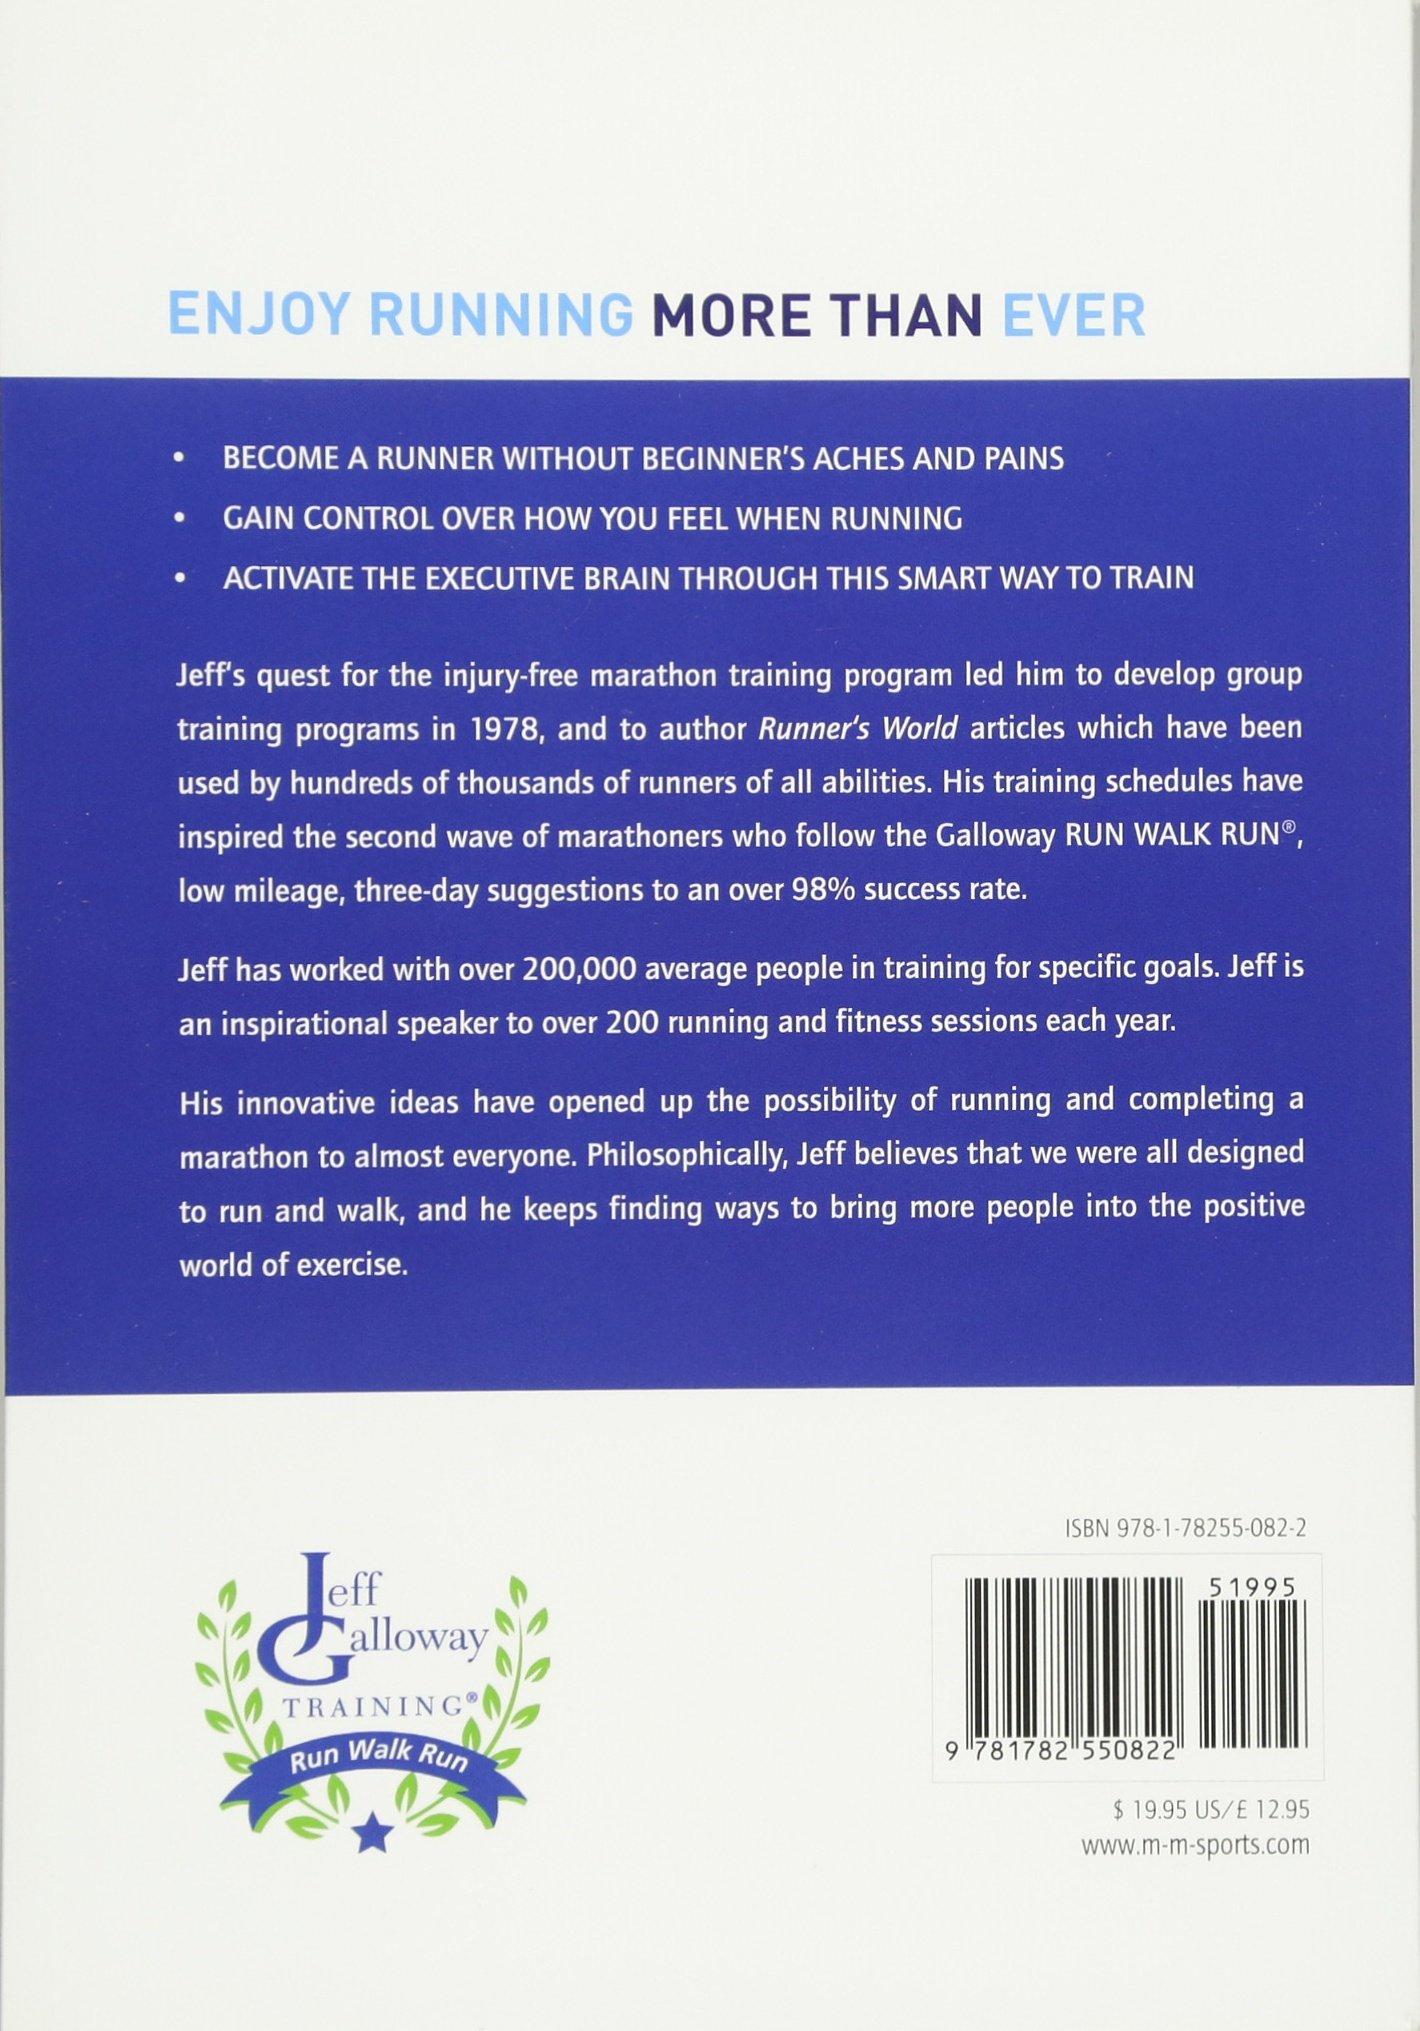 The Run Walk Run Method·: Jeff Galloway: 9781782550822: Amazon.com: Books